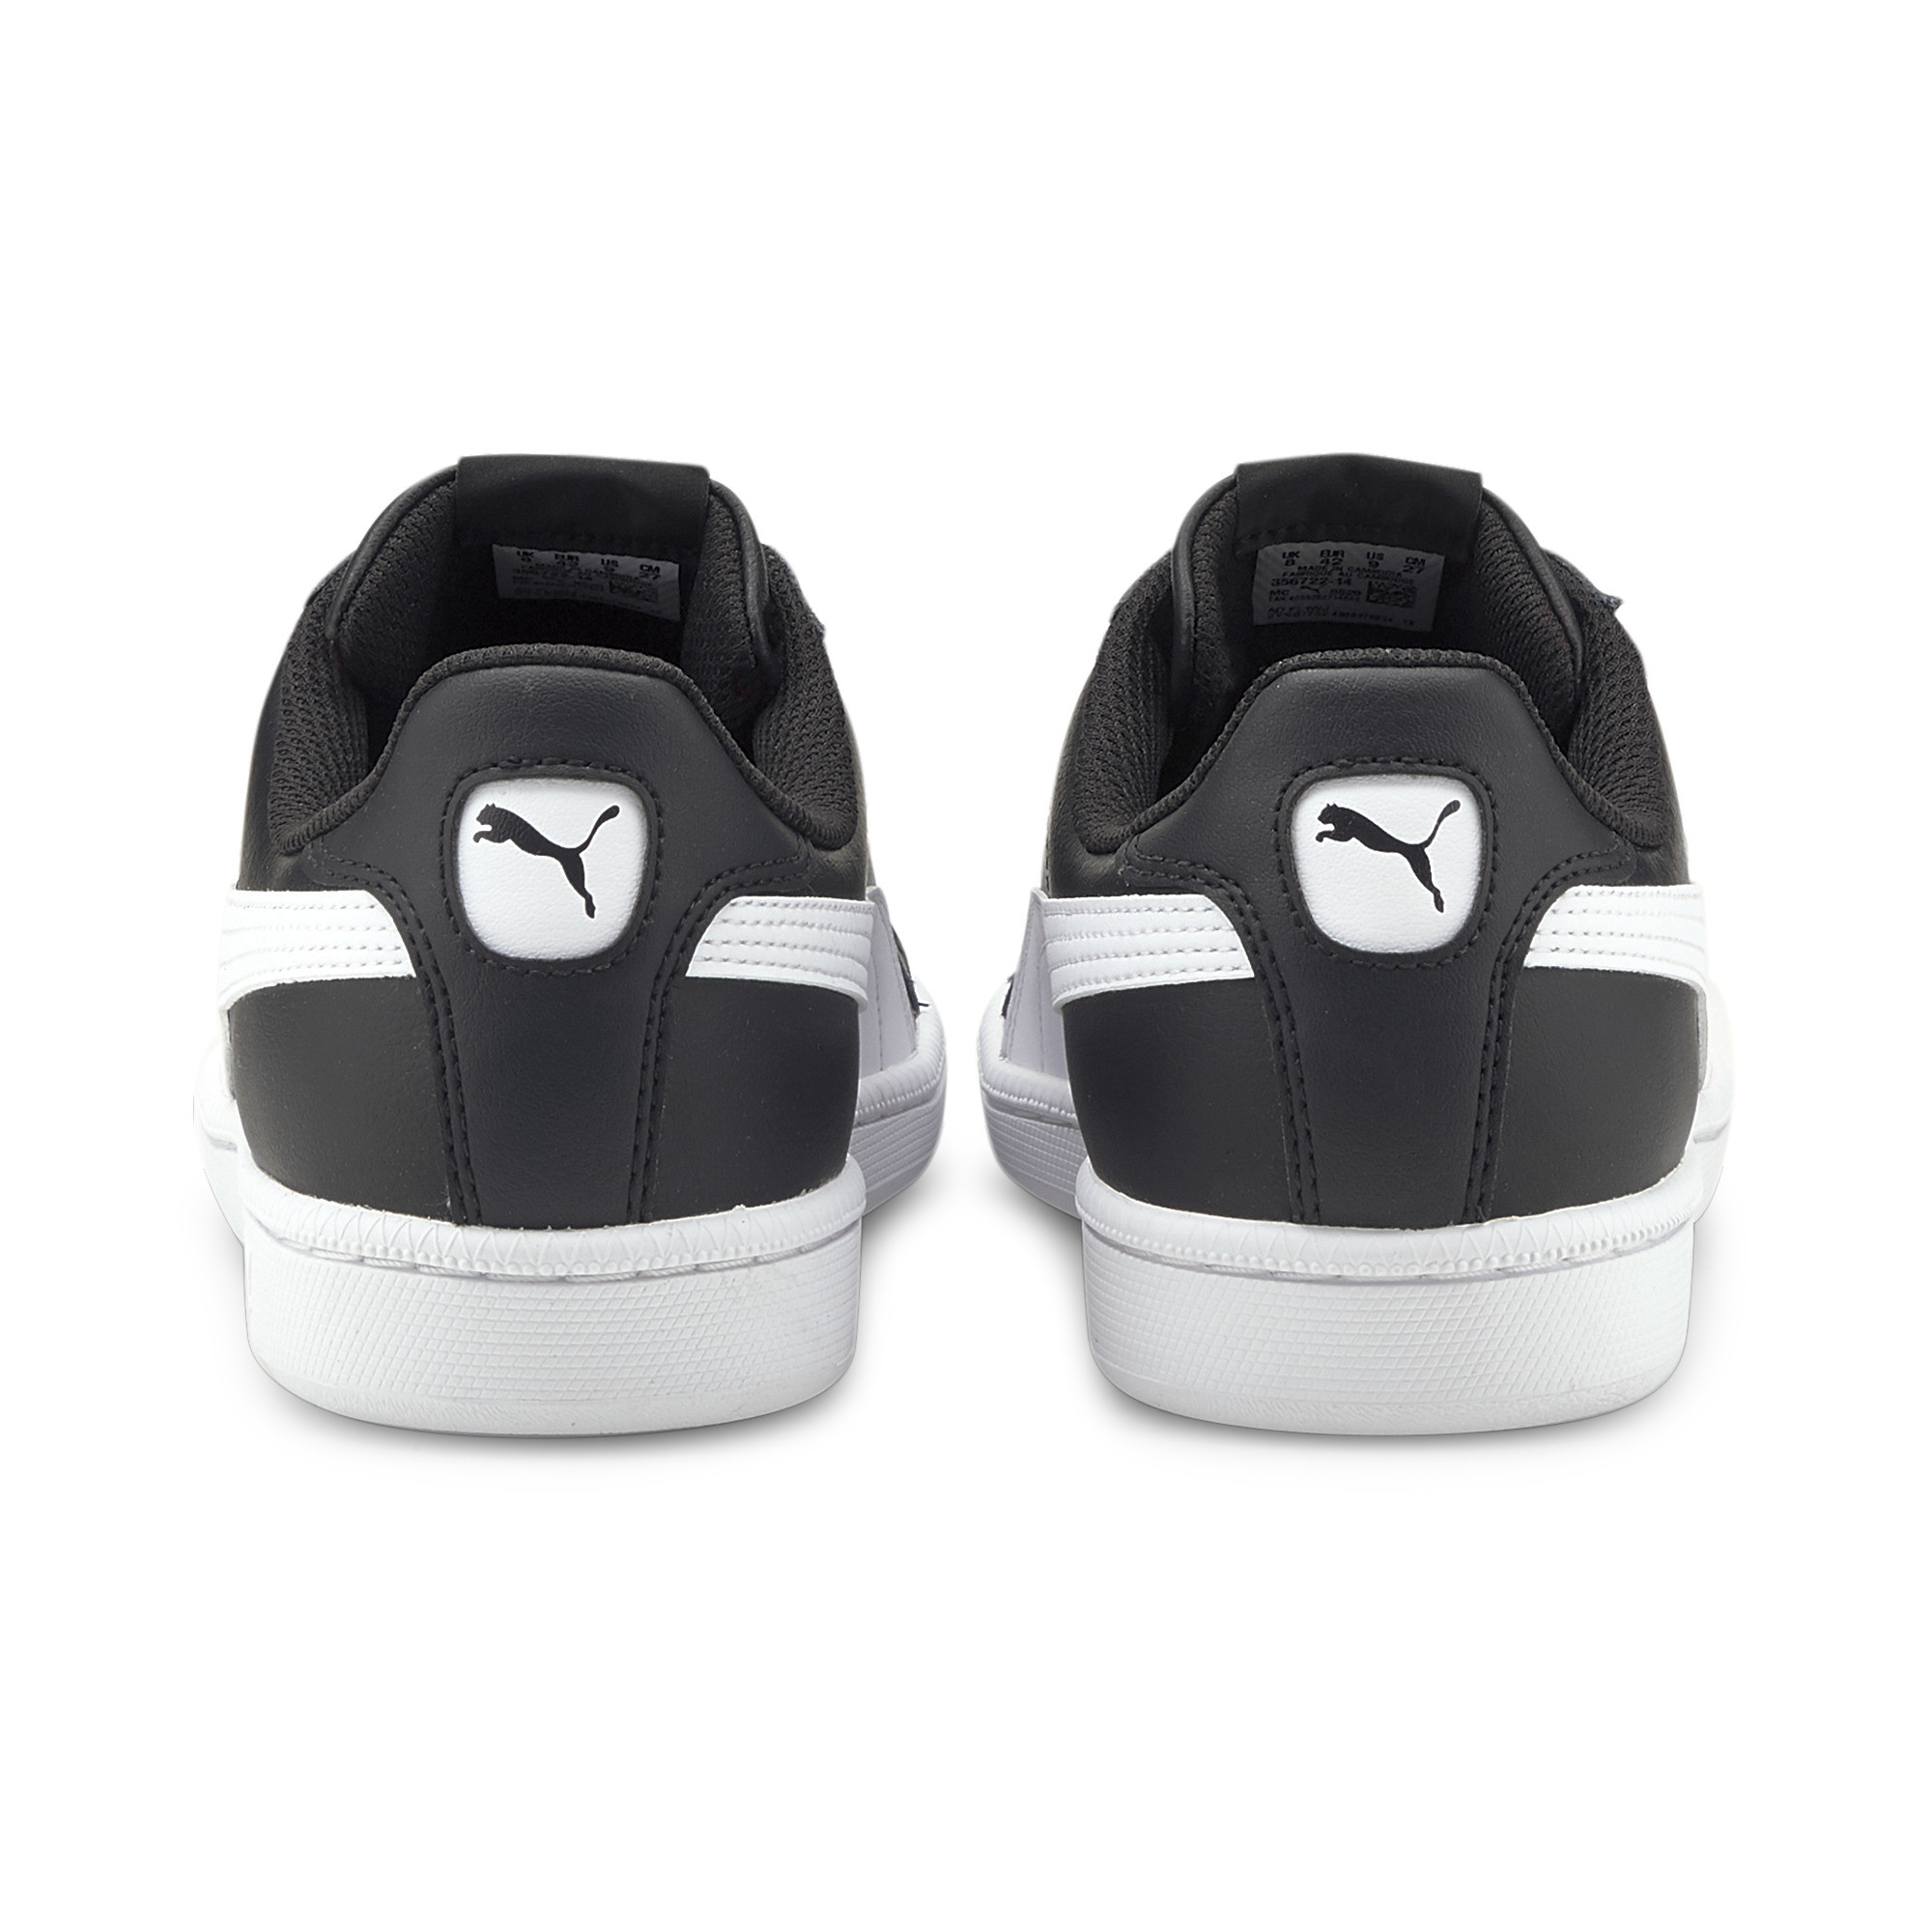 Indexbild 23 - PUMA Smash Trainers Schuhe Sneakers Sport Classics Unisex Neu